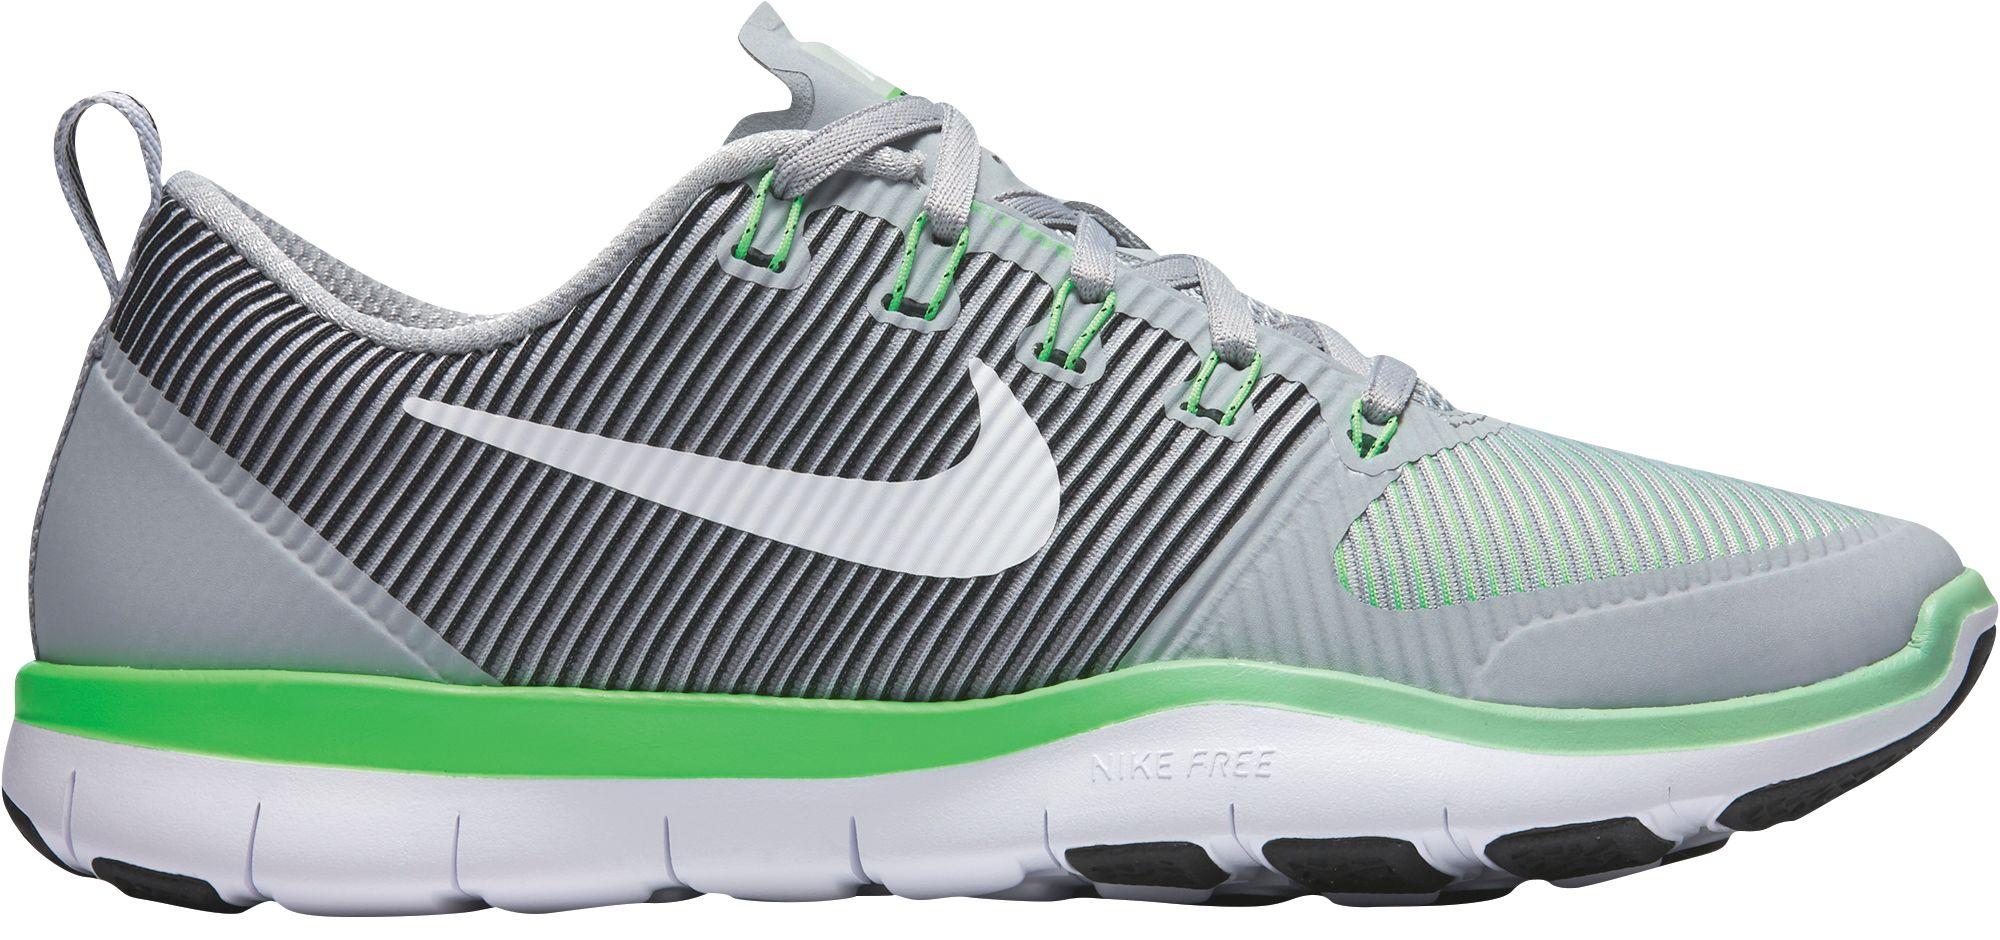 save off f8f83 67e3d 70%OFF Nike Mens Free Train Versatility Training Shoes DICKS Sporting Goods